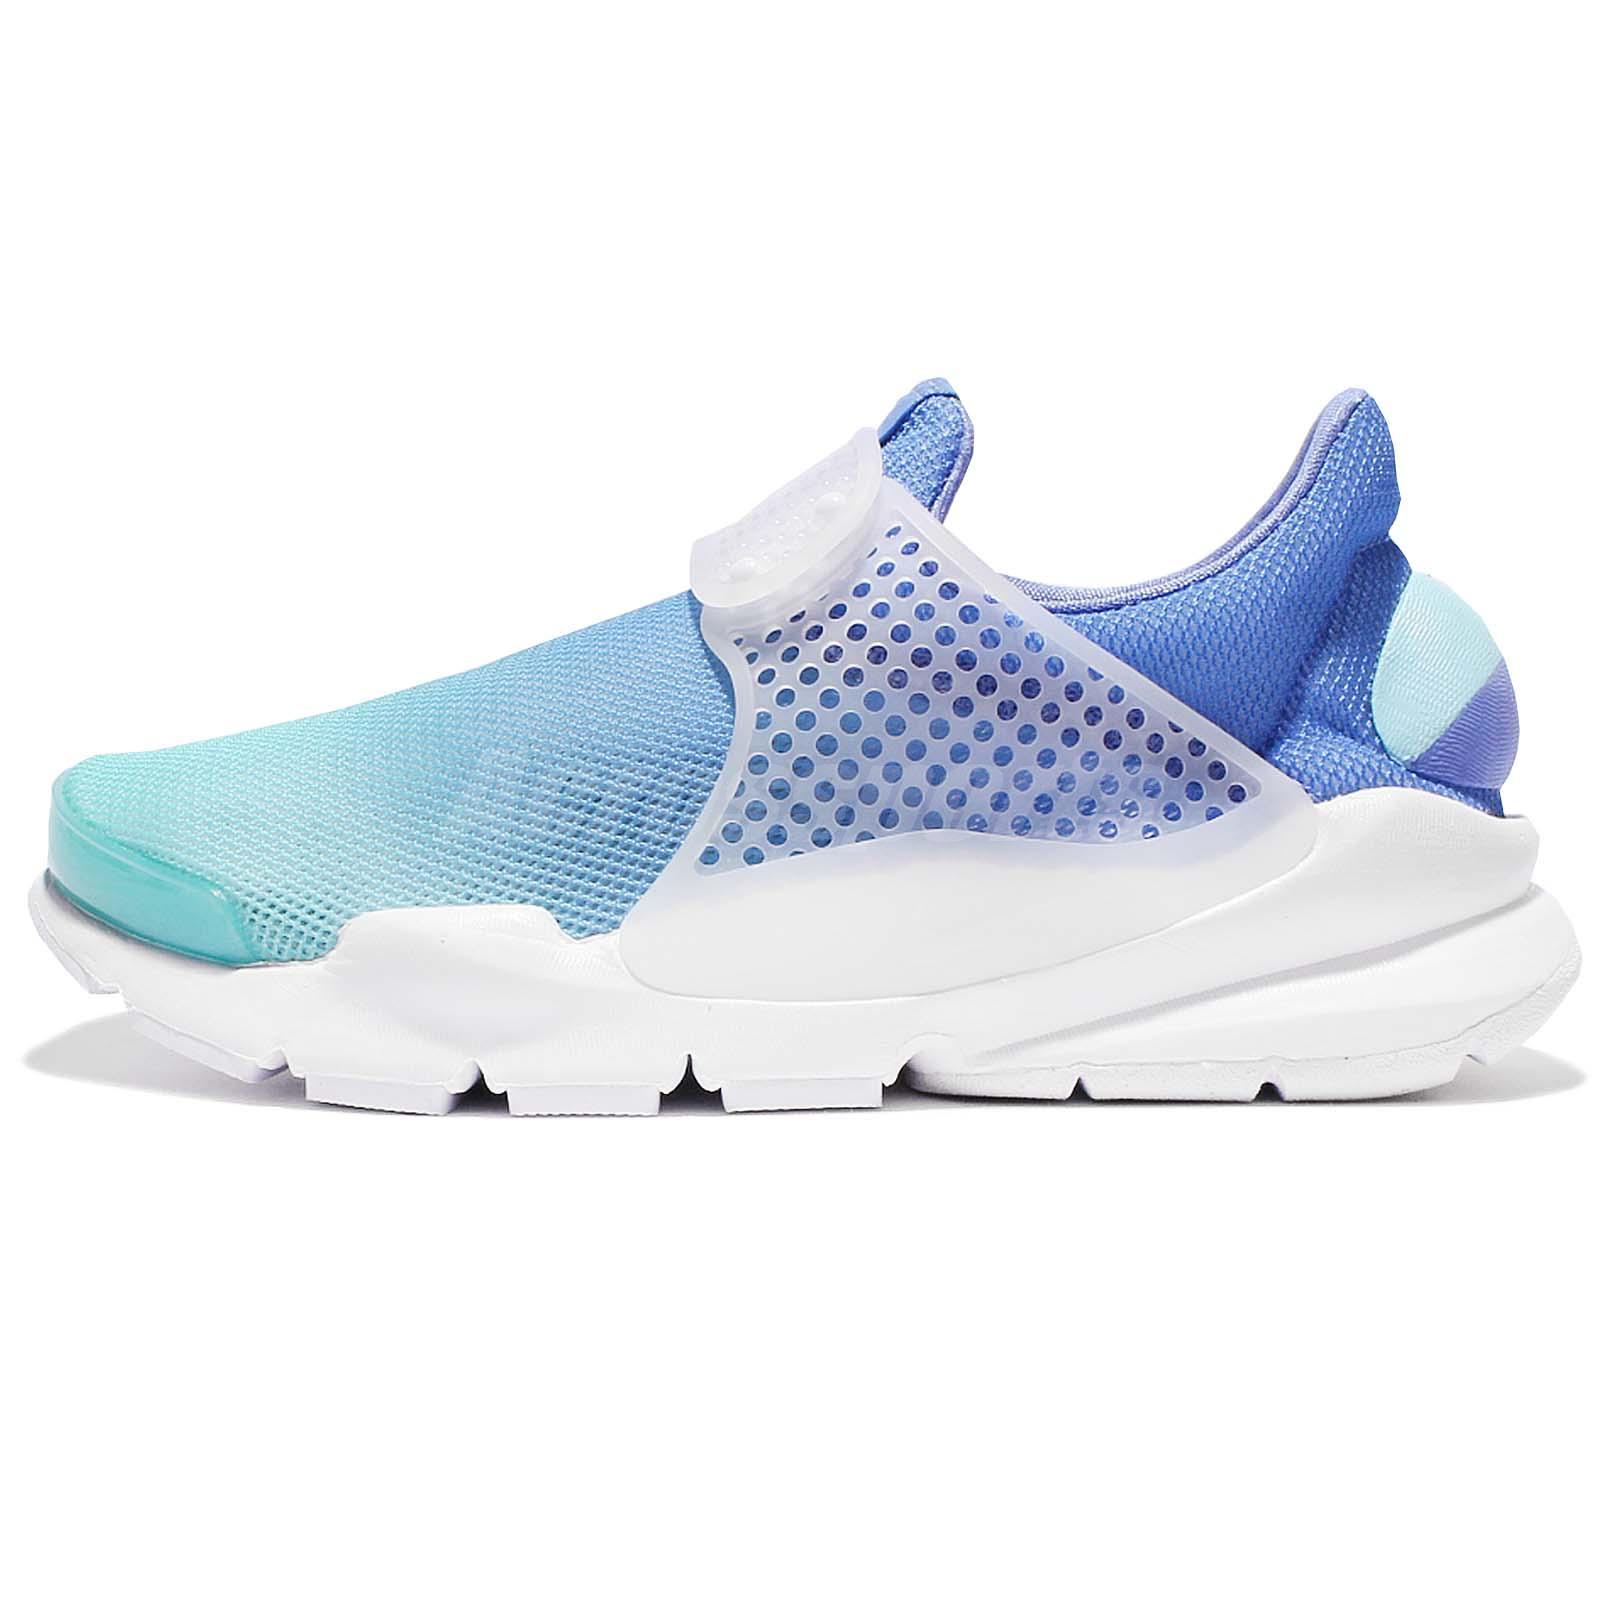 5ca053a1 Nike Wmns Sock Dart BR Breathe Gradient Blue White Women Running Shoe  896446-400